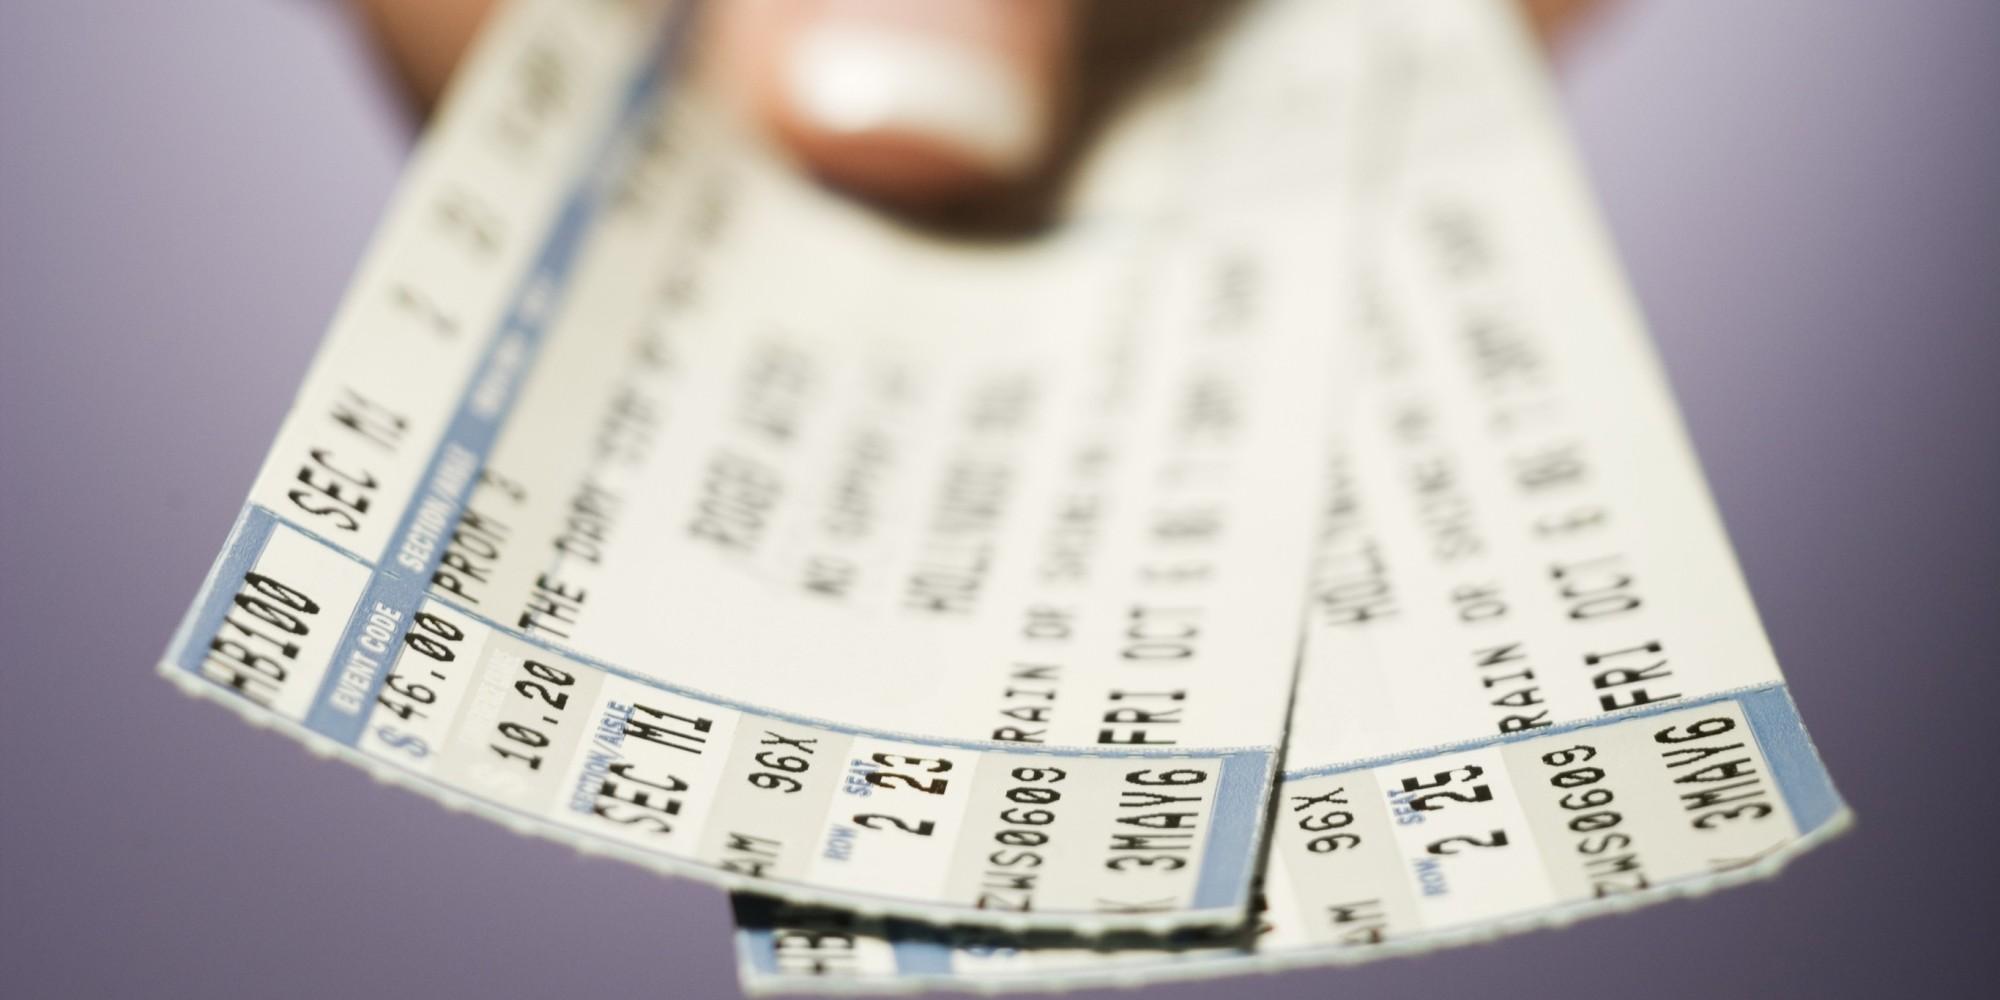 concert-tickets.jpg